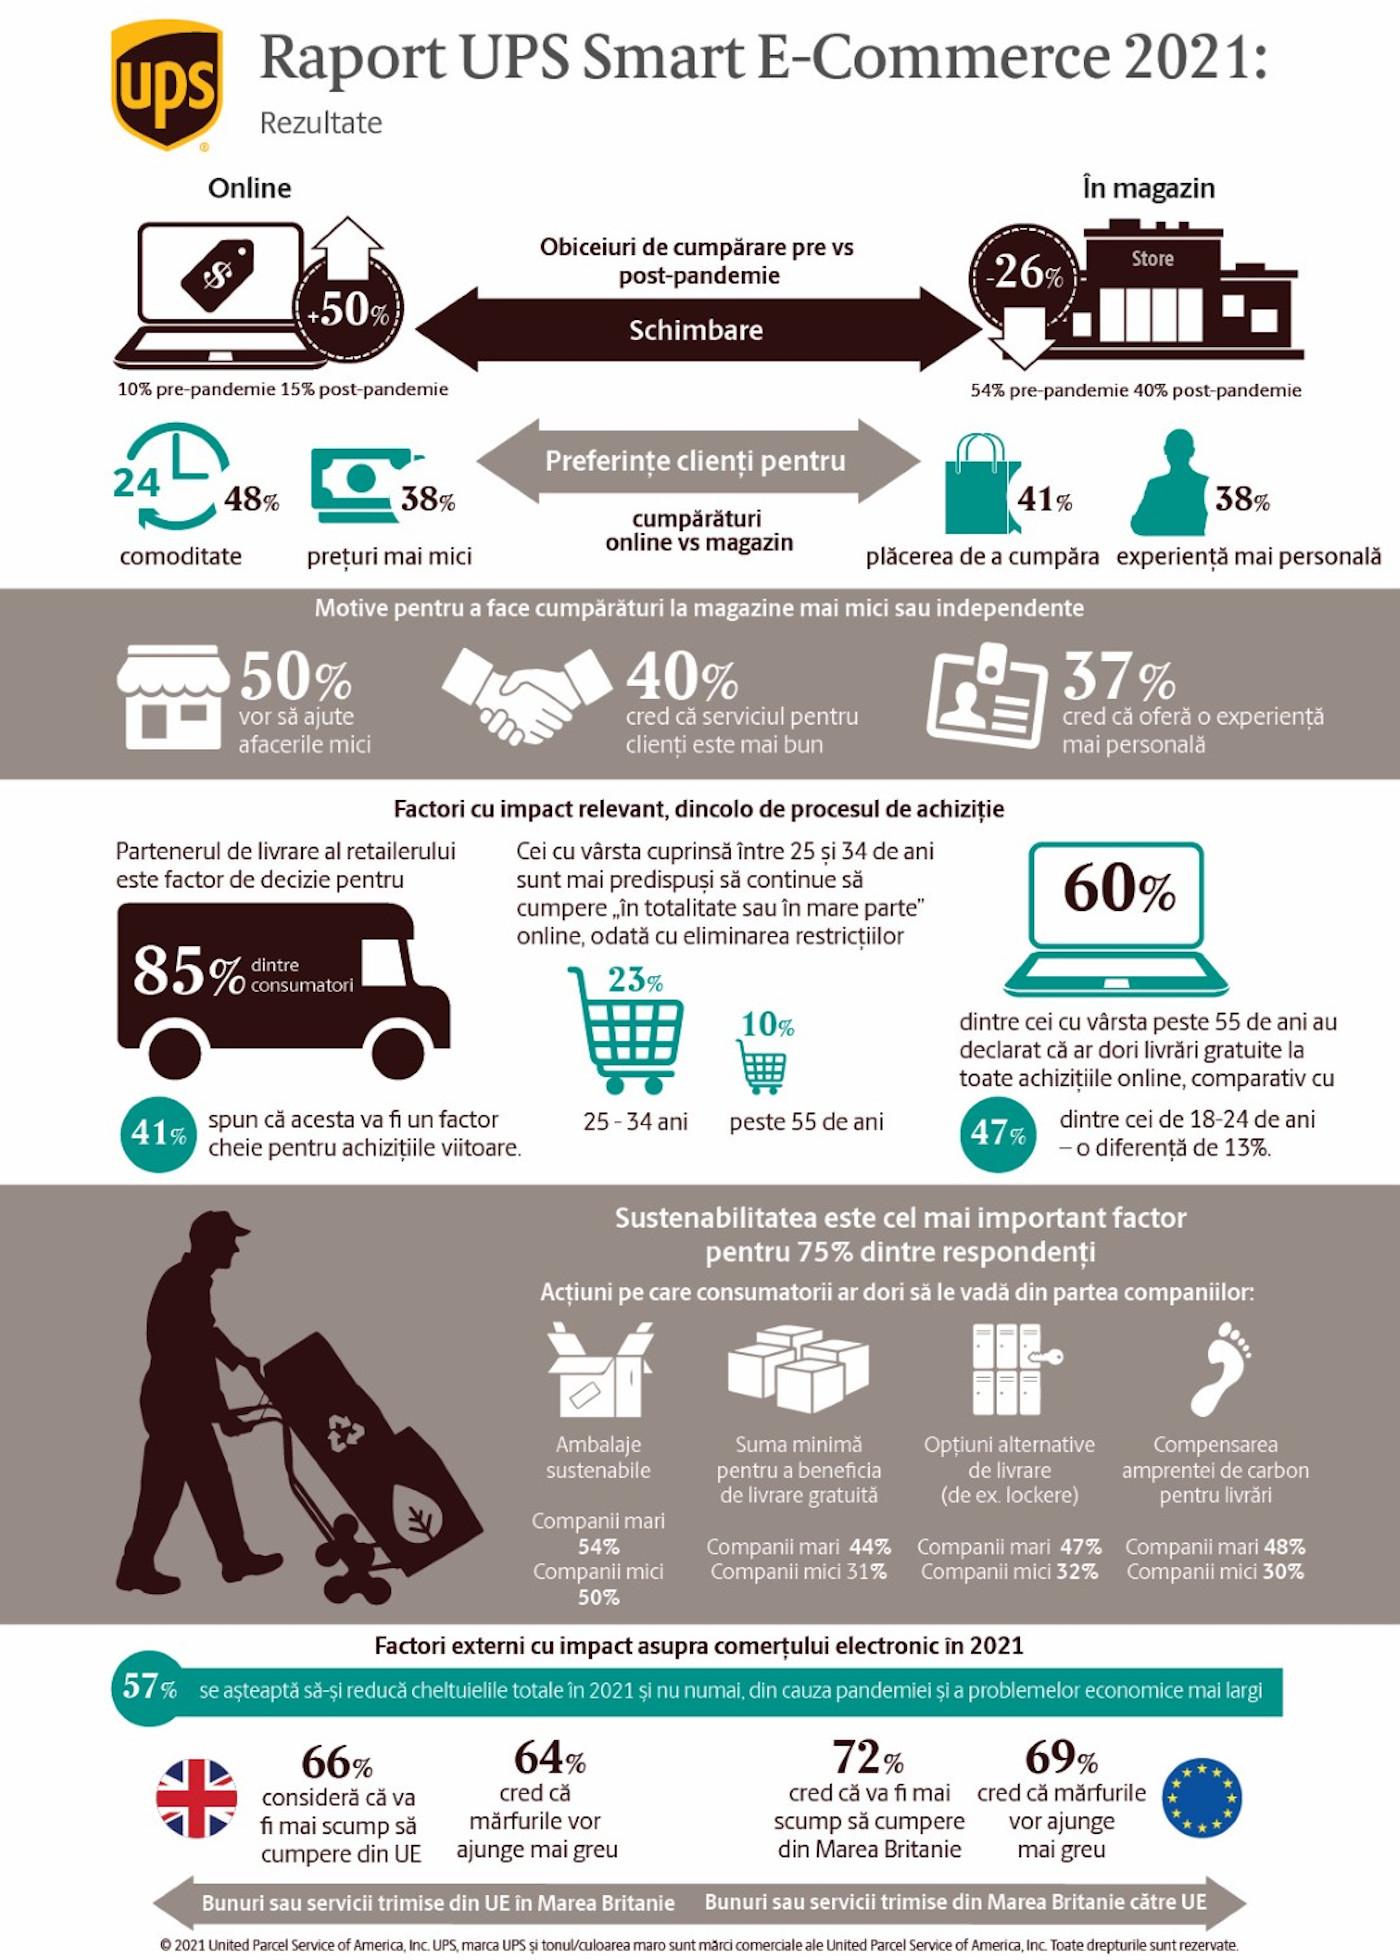 Infografic_UPS Smart E-commerce Report 2021